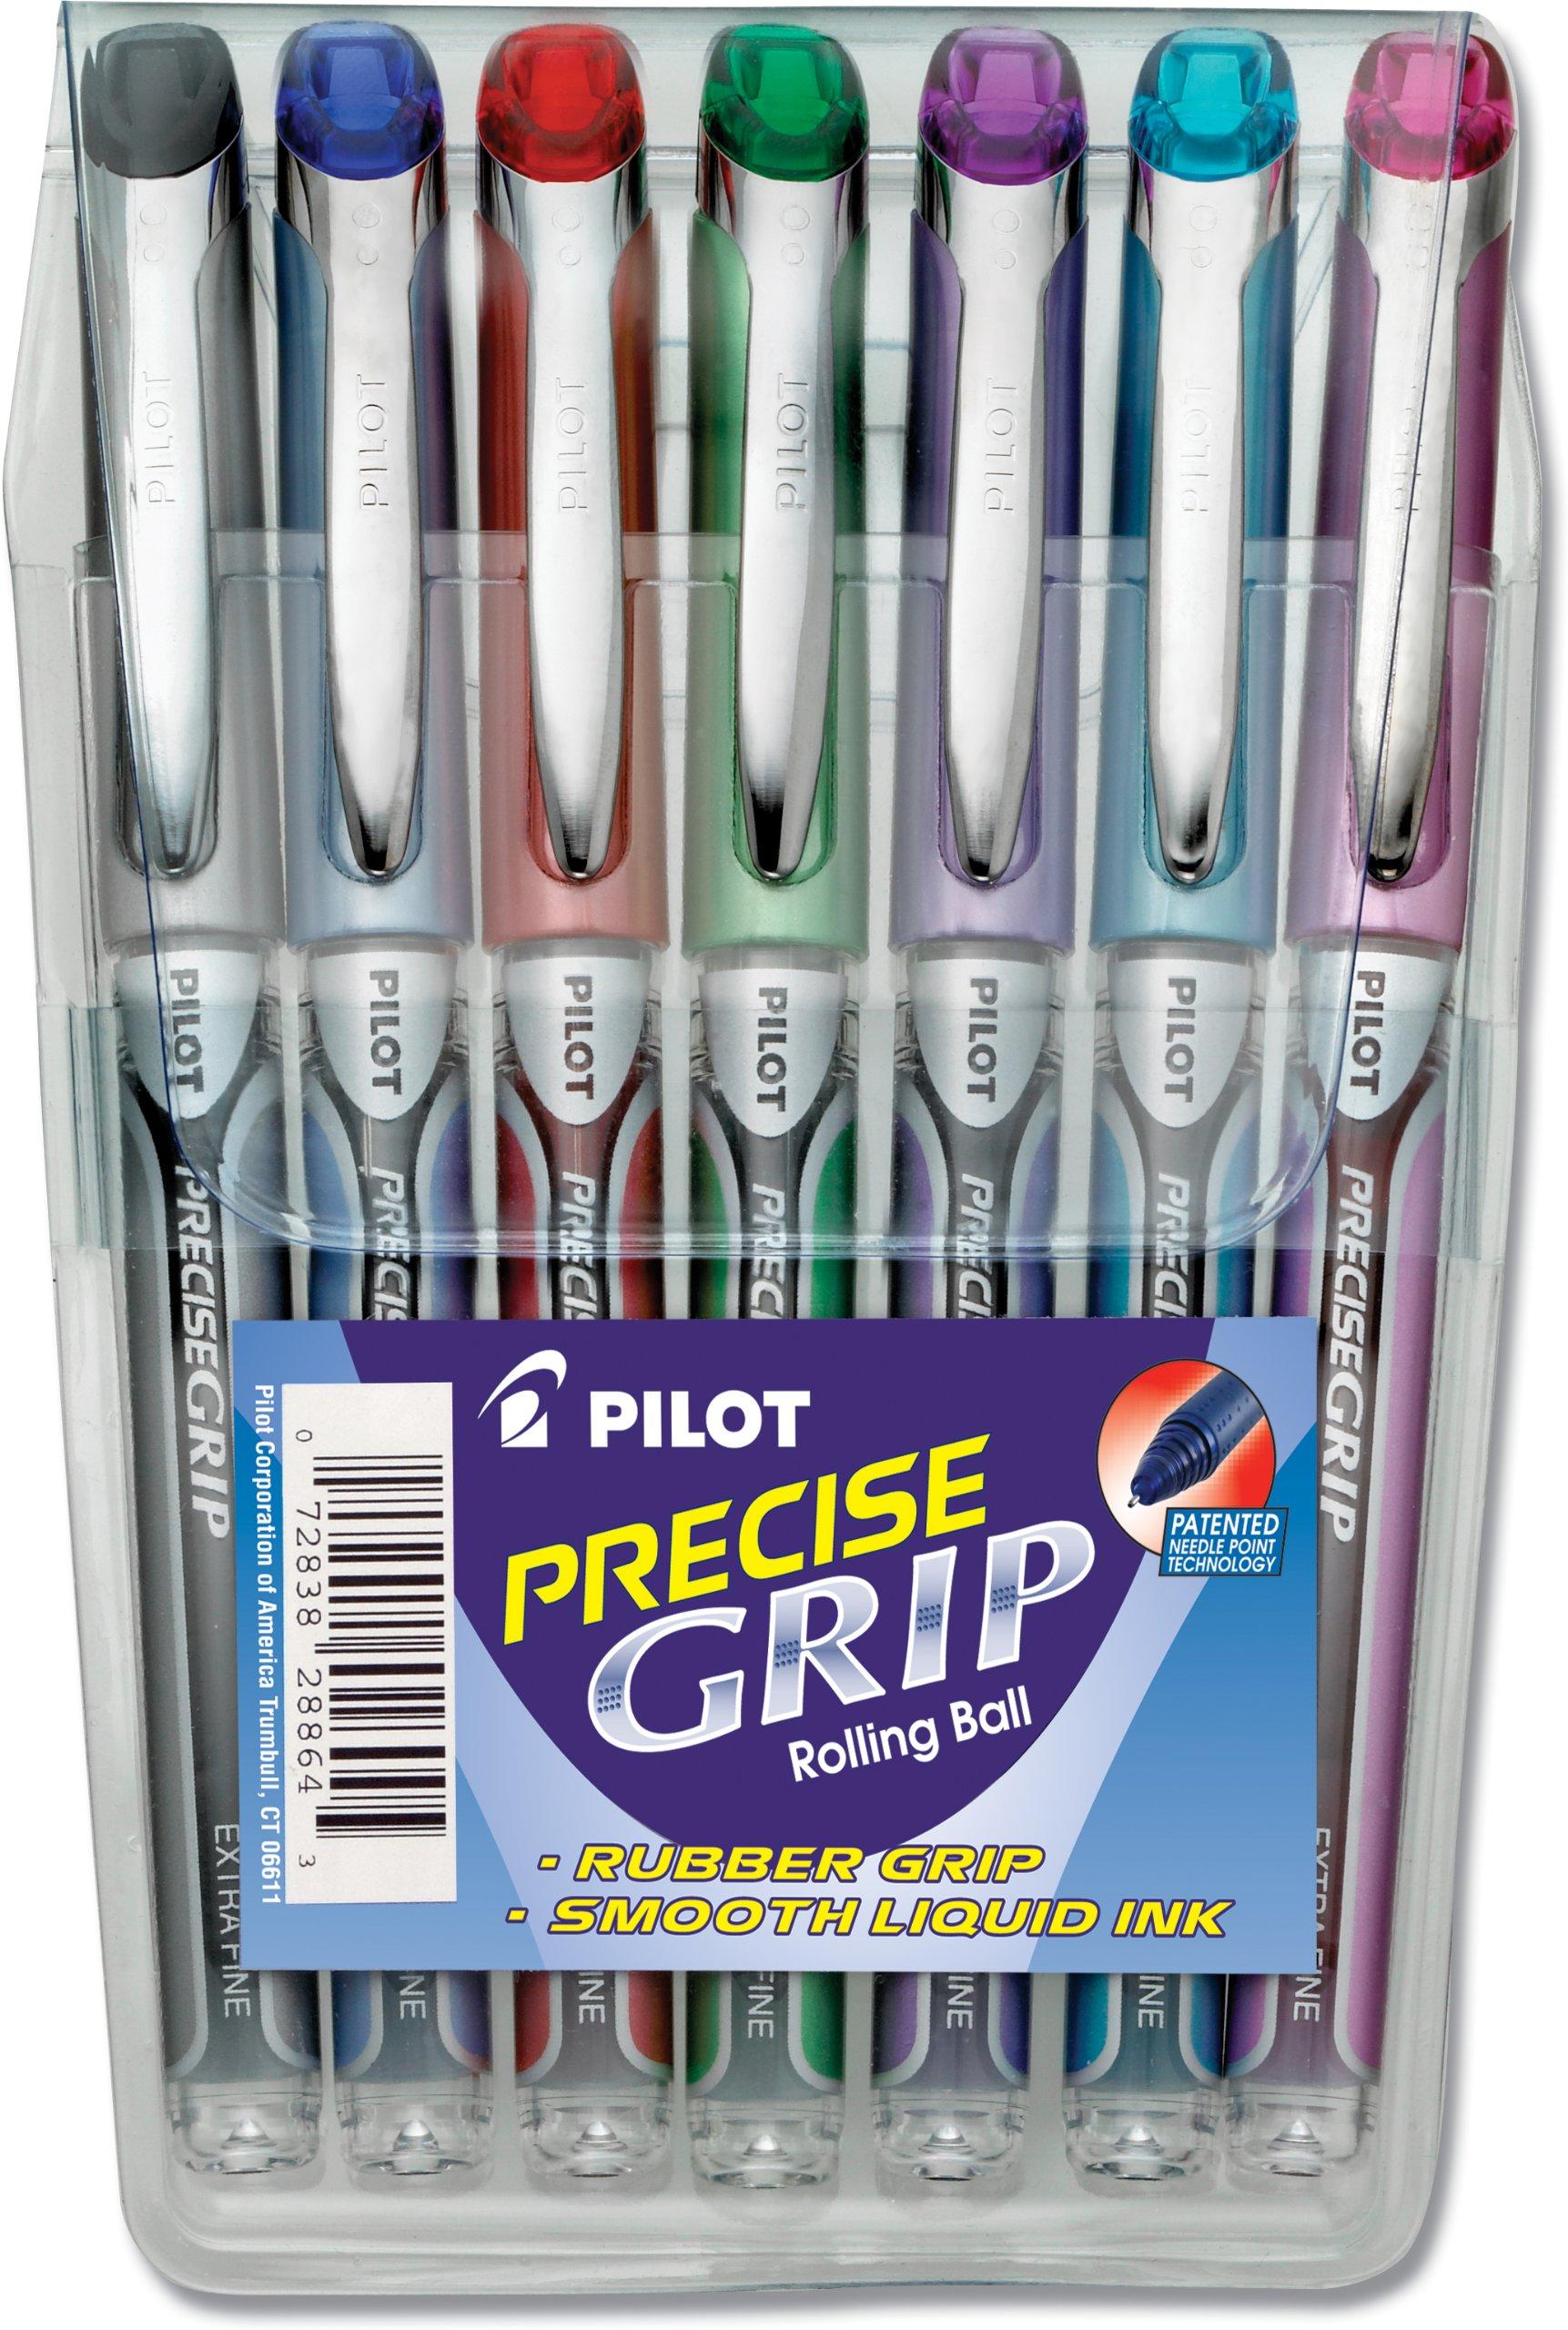 Pilot Precise Grip Liquid Ink Rolling Ball Pens, Extra Fine.